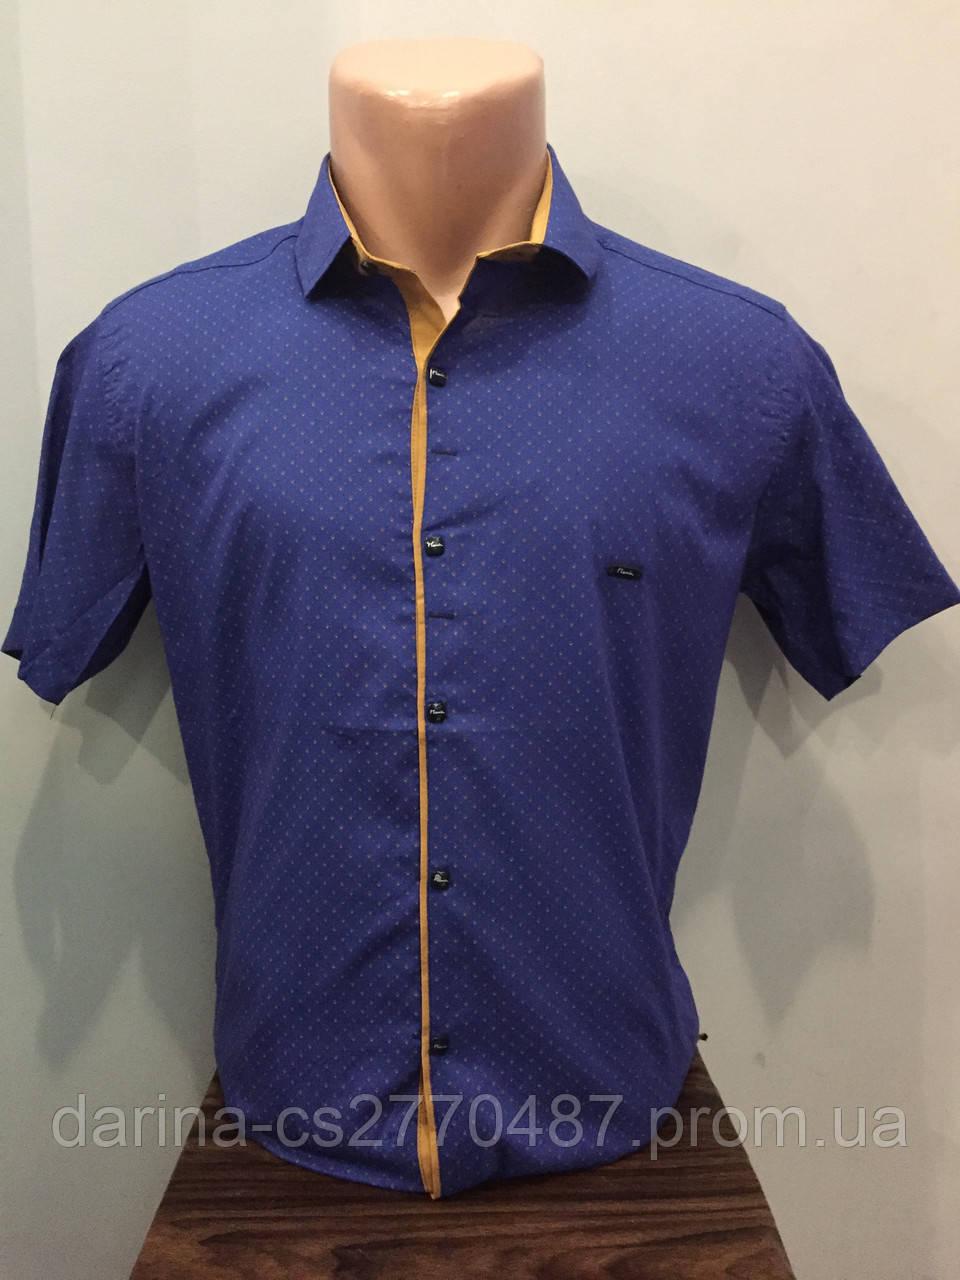 Летняя мужская рубашка на кнопках S,М,L